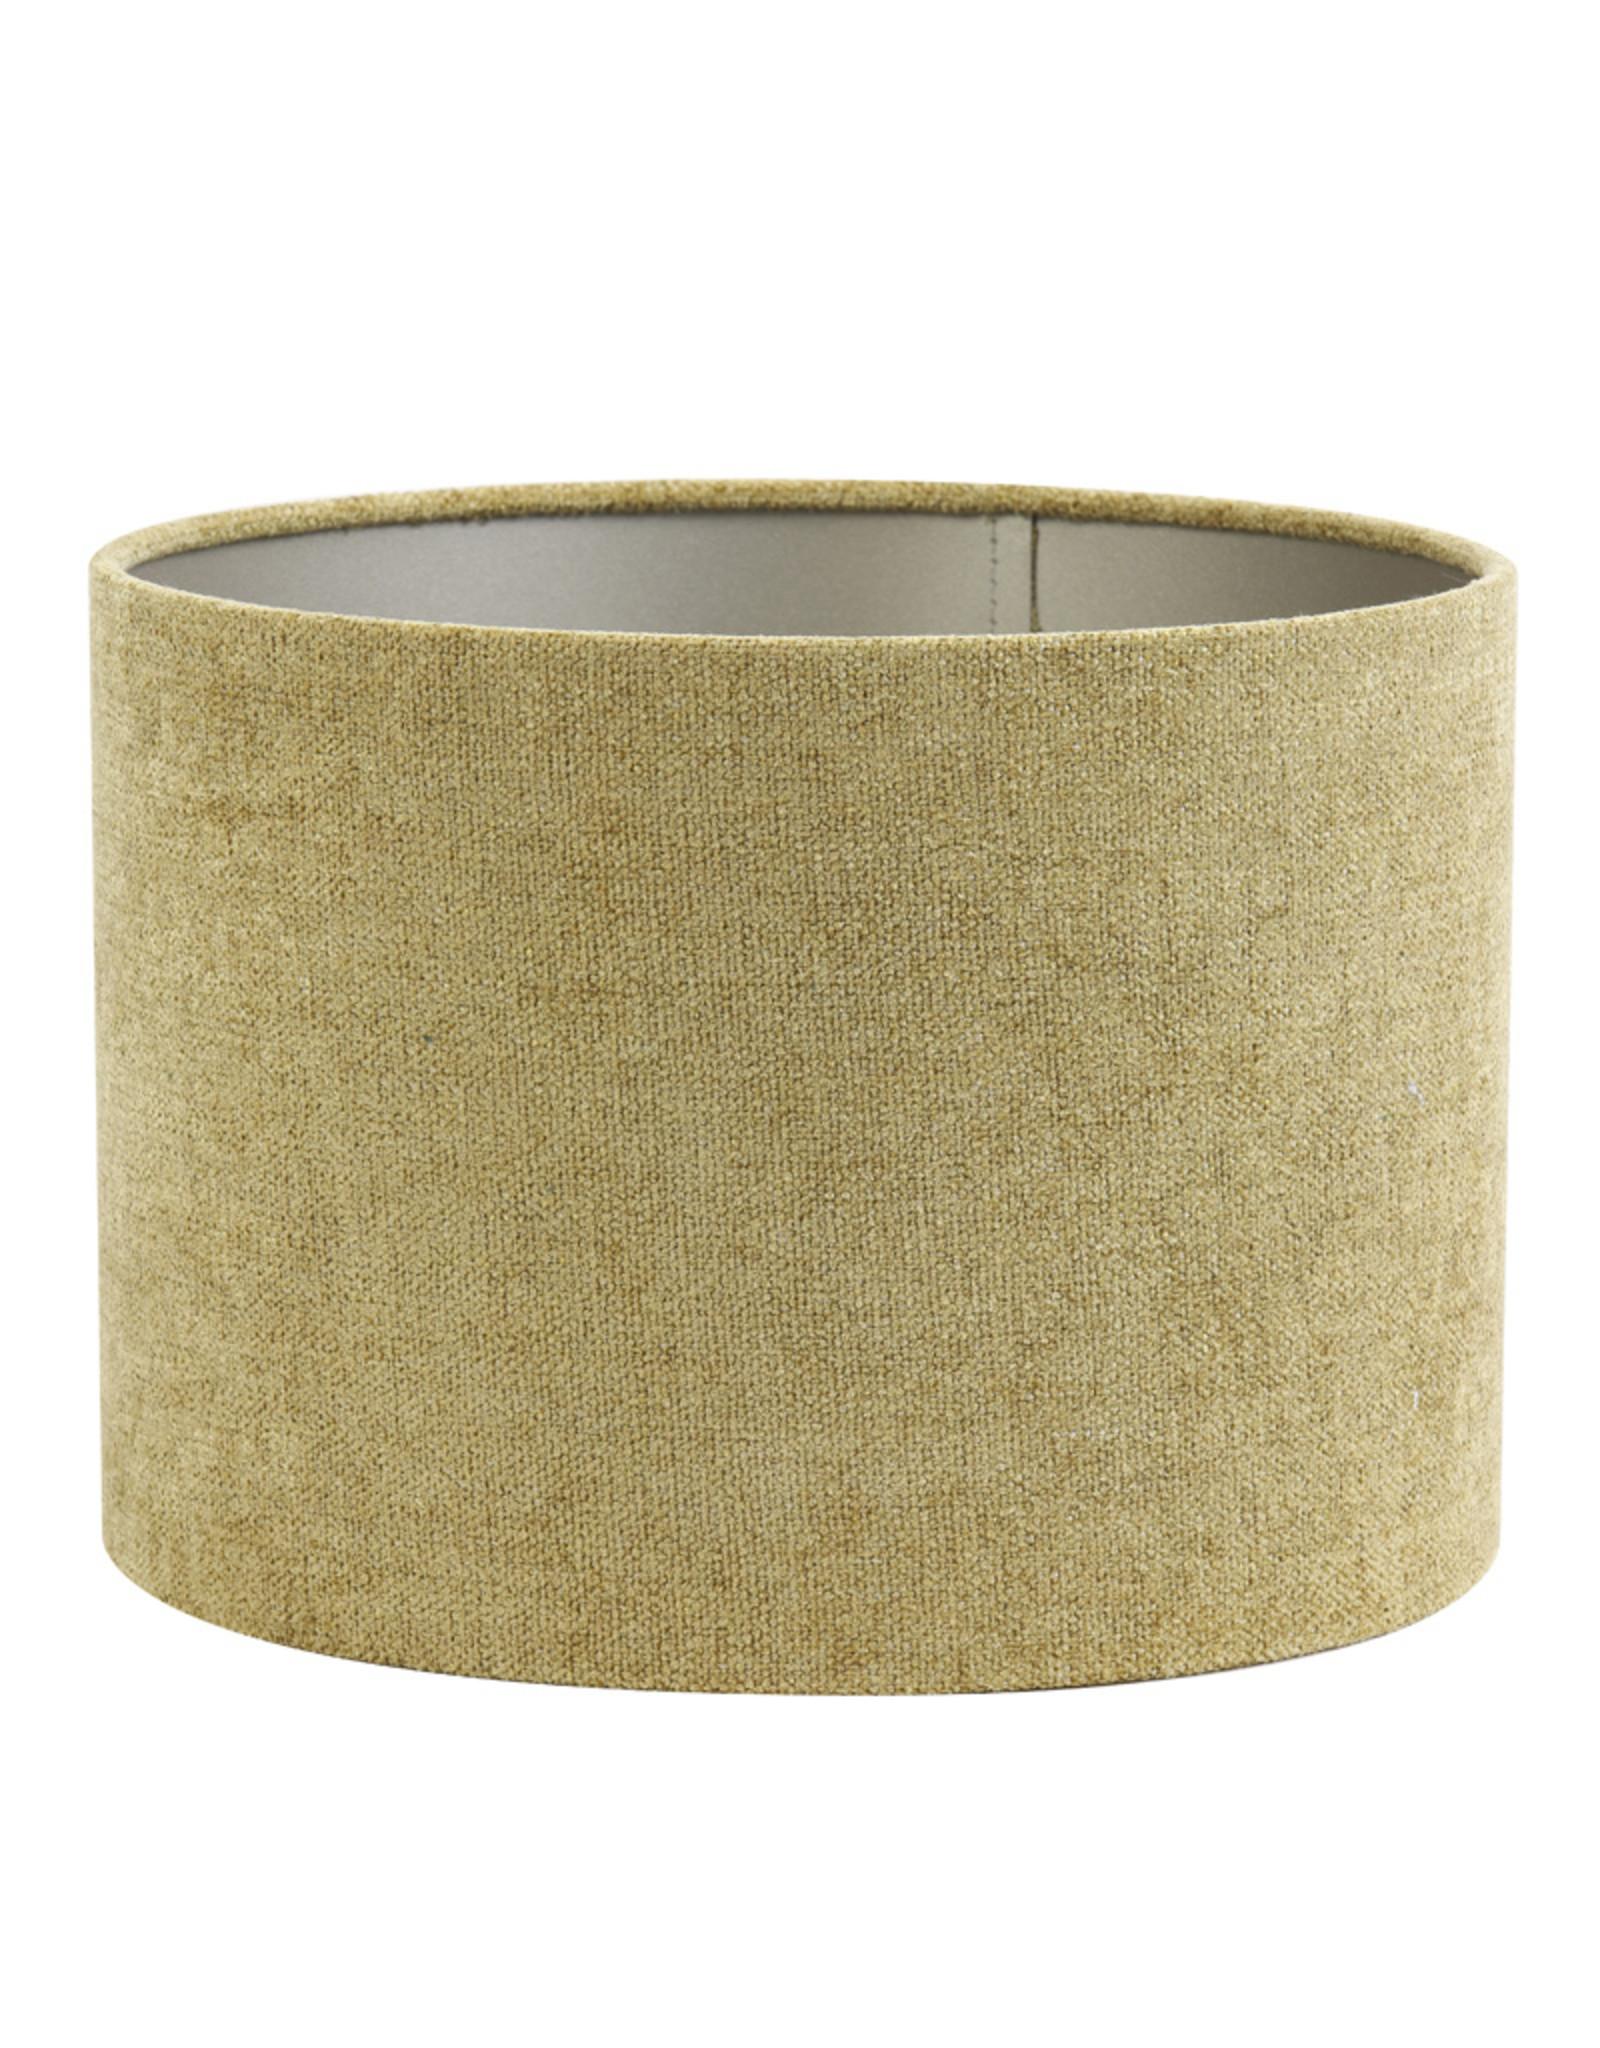 Light & Living Kap cilinder 50-50-38 cm FANCY goud